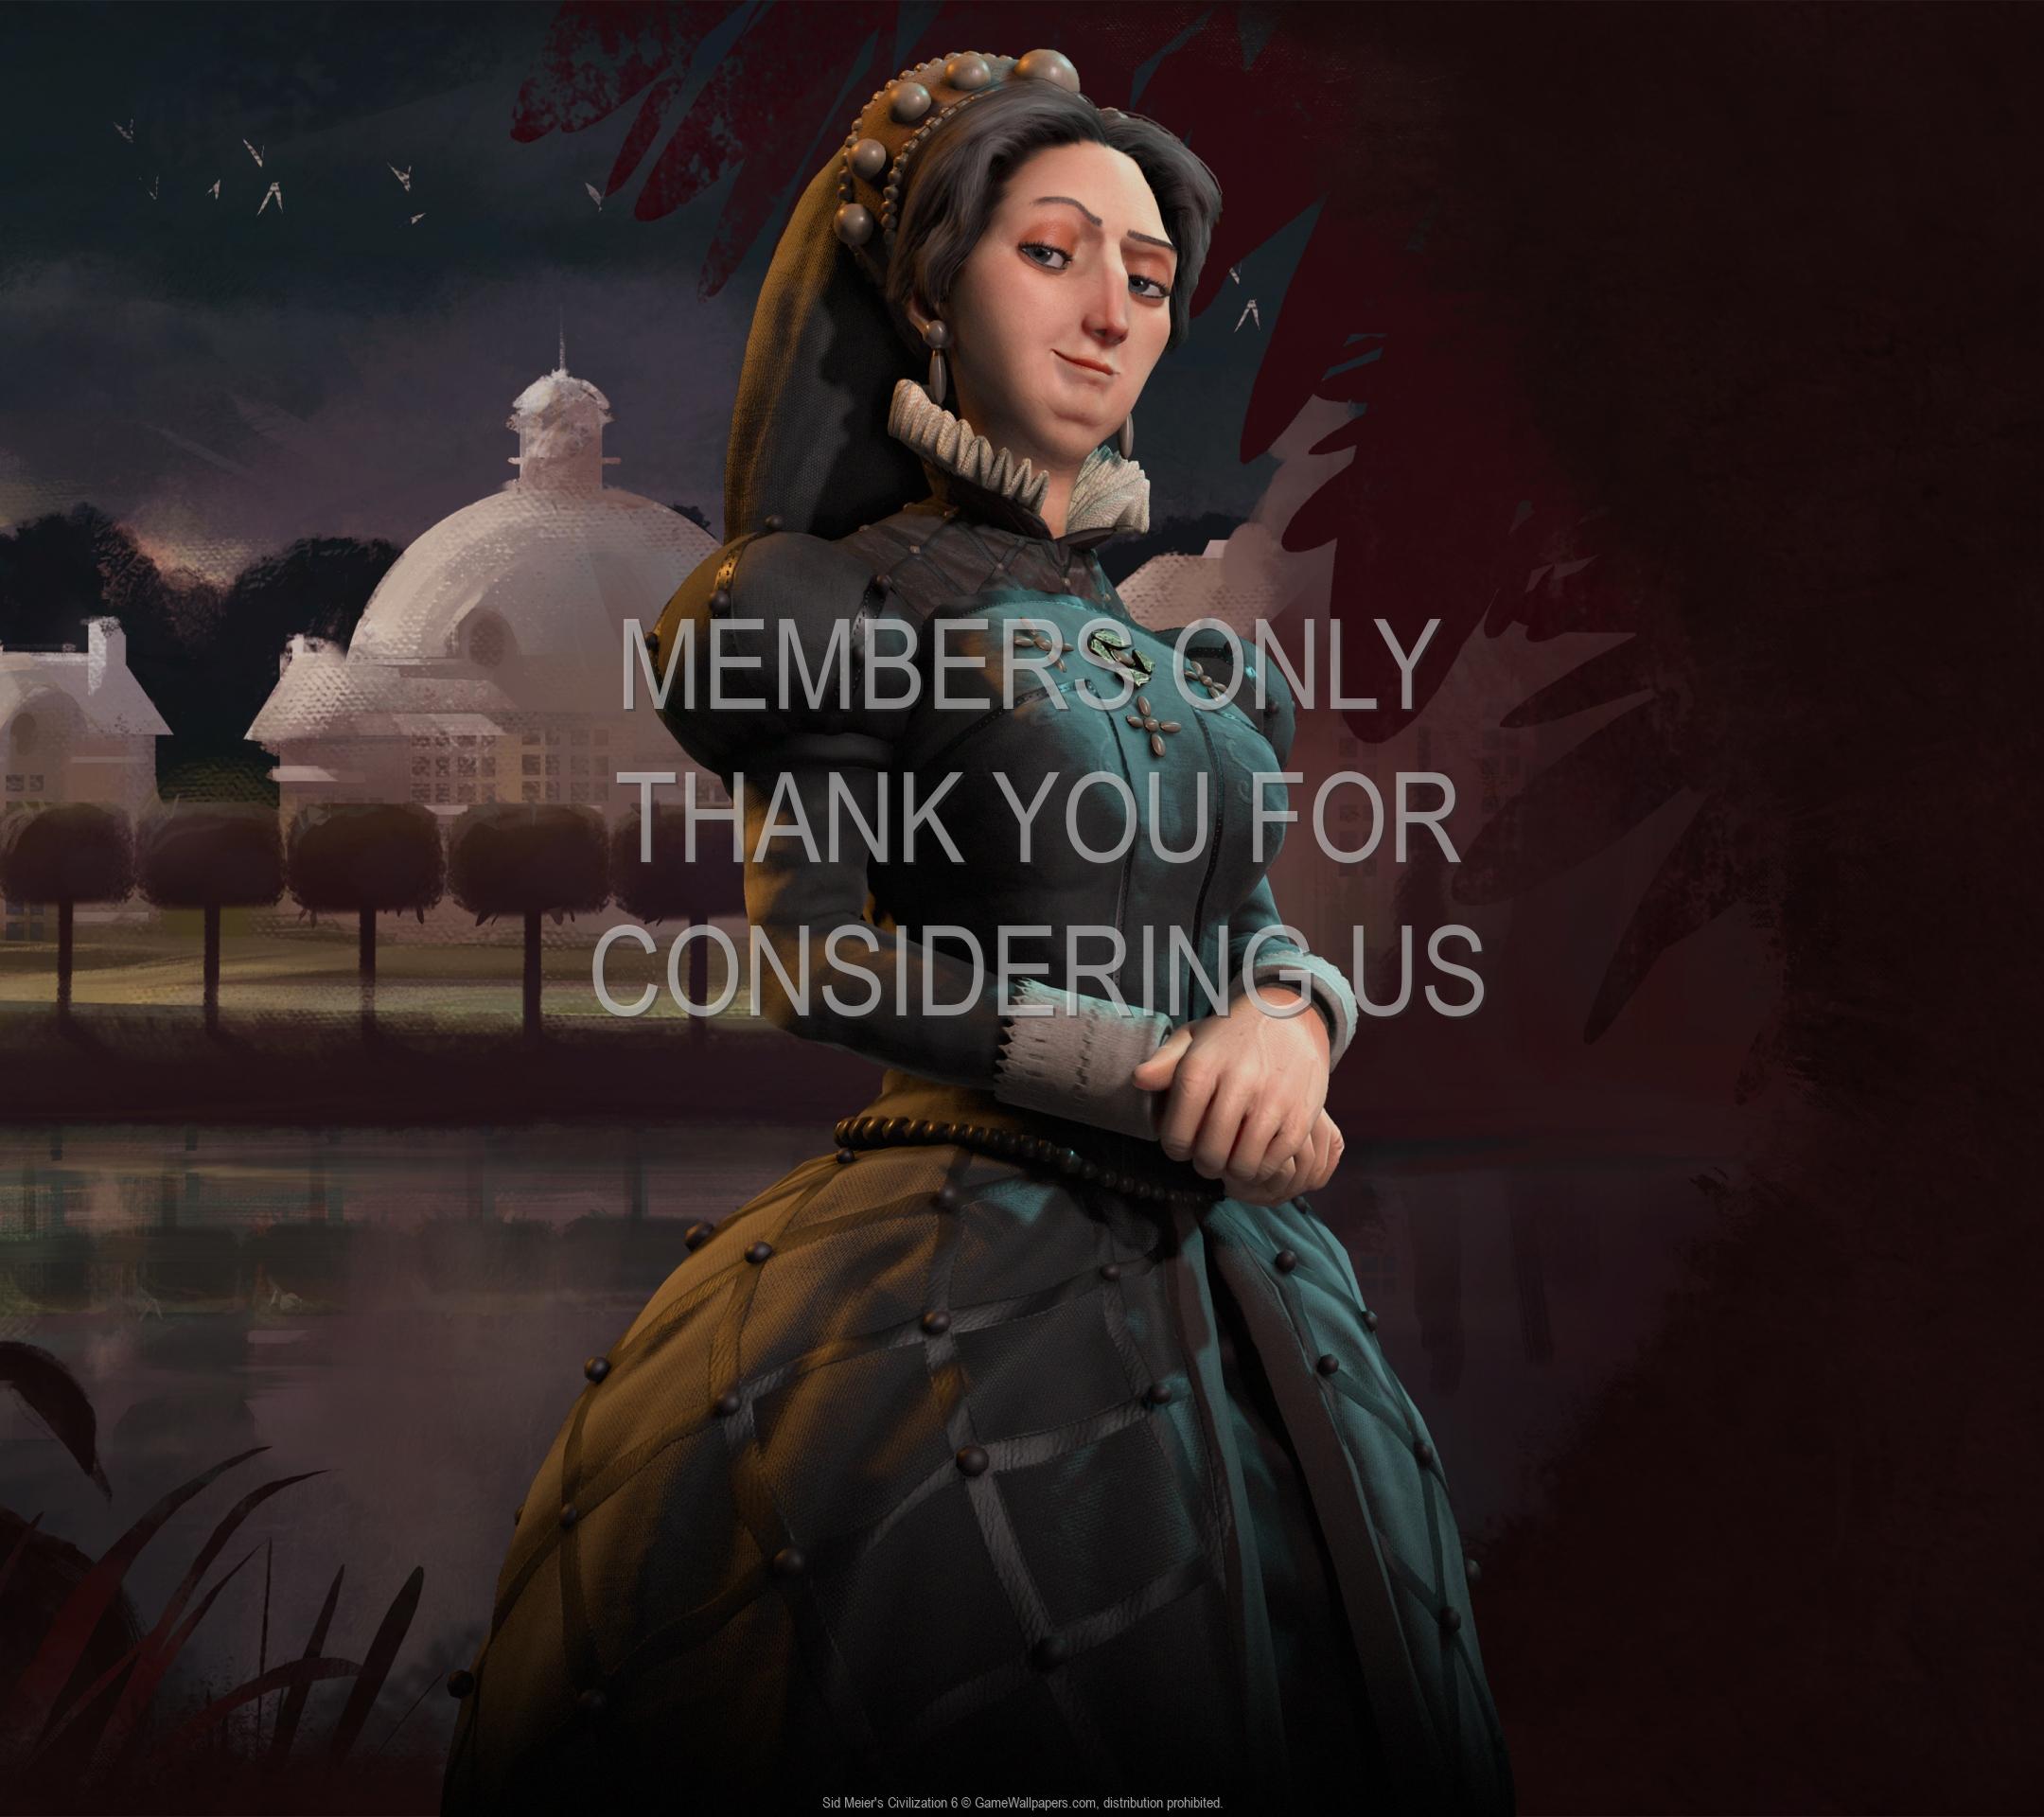 Sid Meier's Civilization 6 1920x1080 Mobile wallpaper or background 03